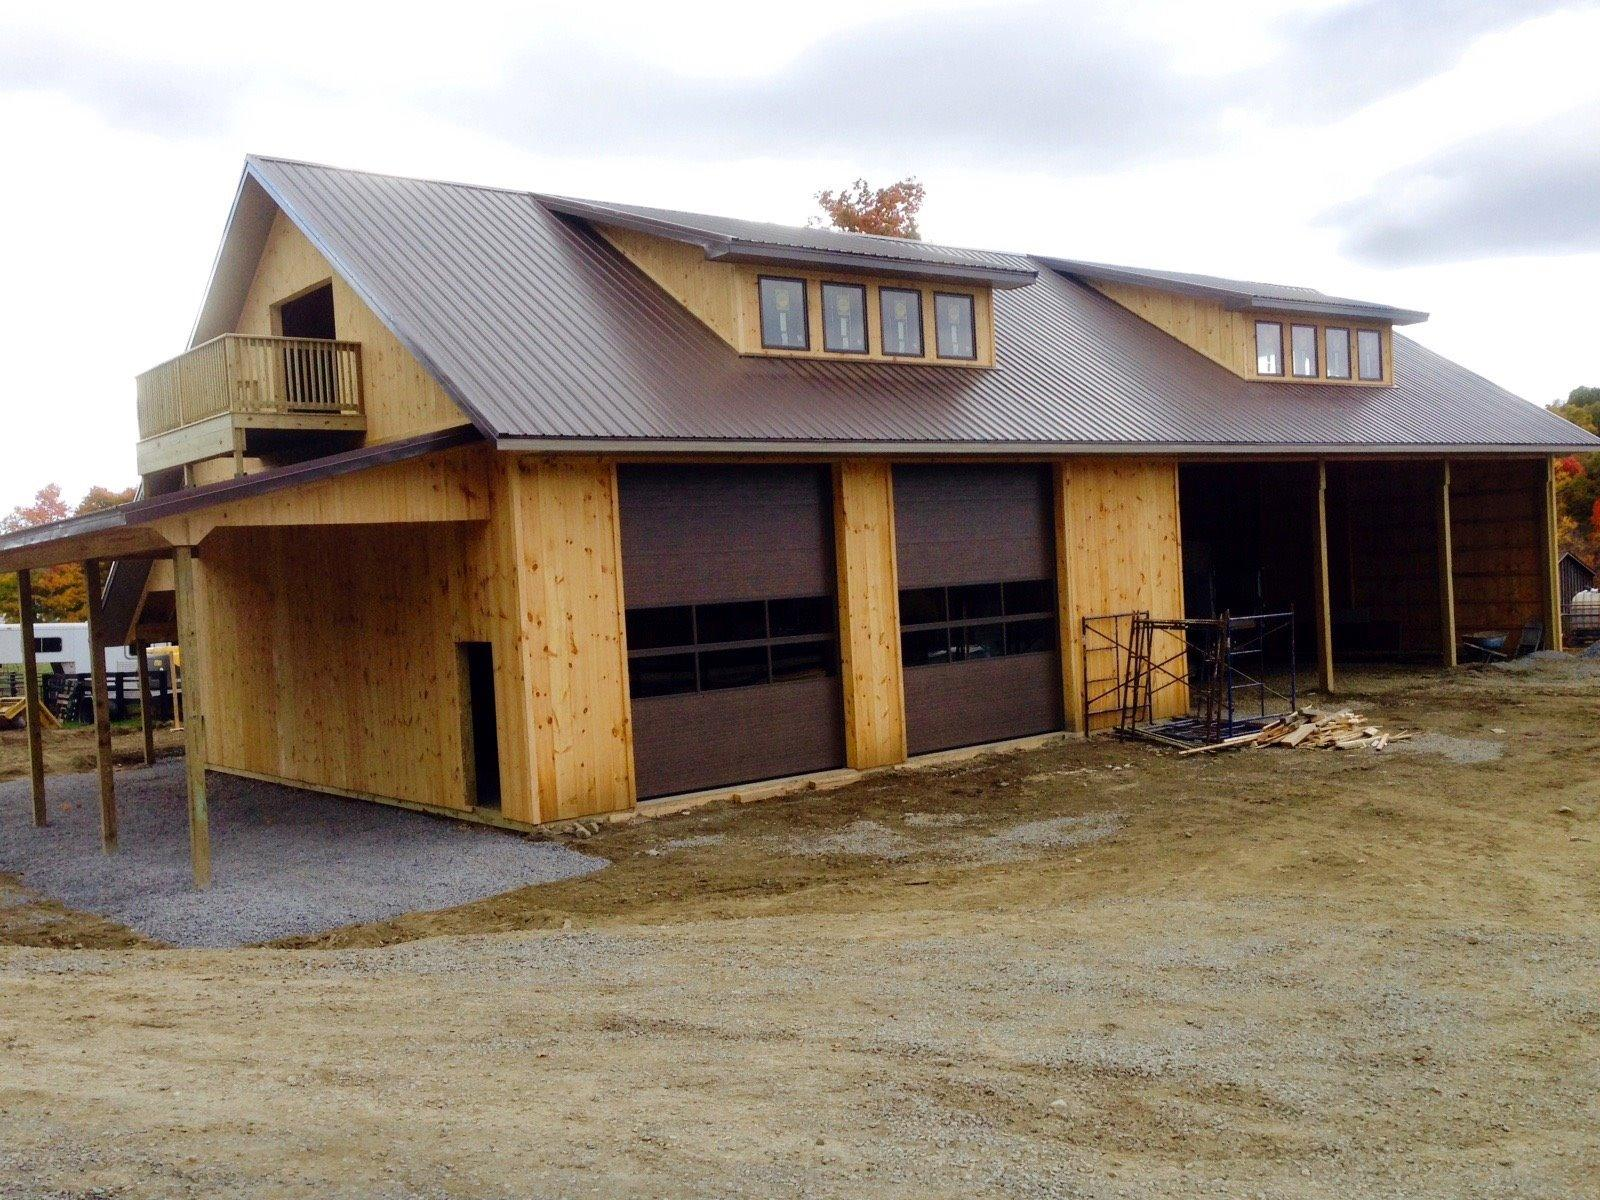 Horse barn builders llc in gettysburg pa 17325 for Horse barn homes